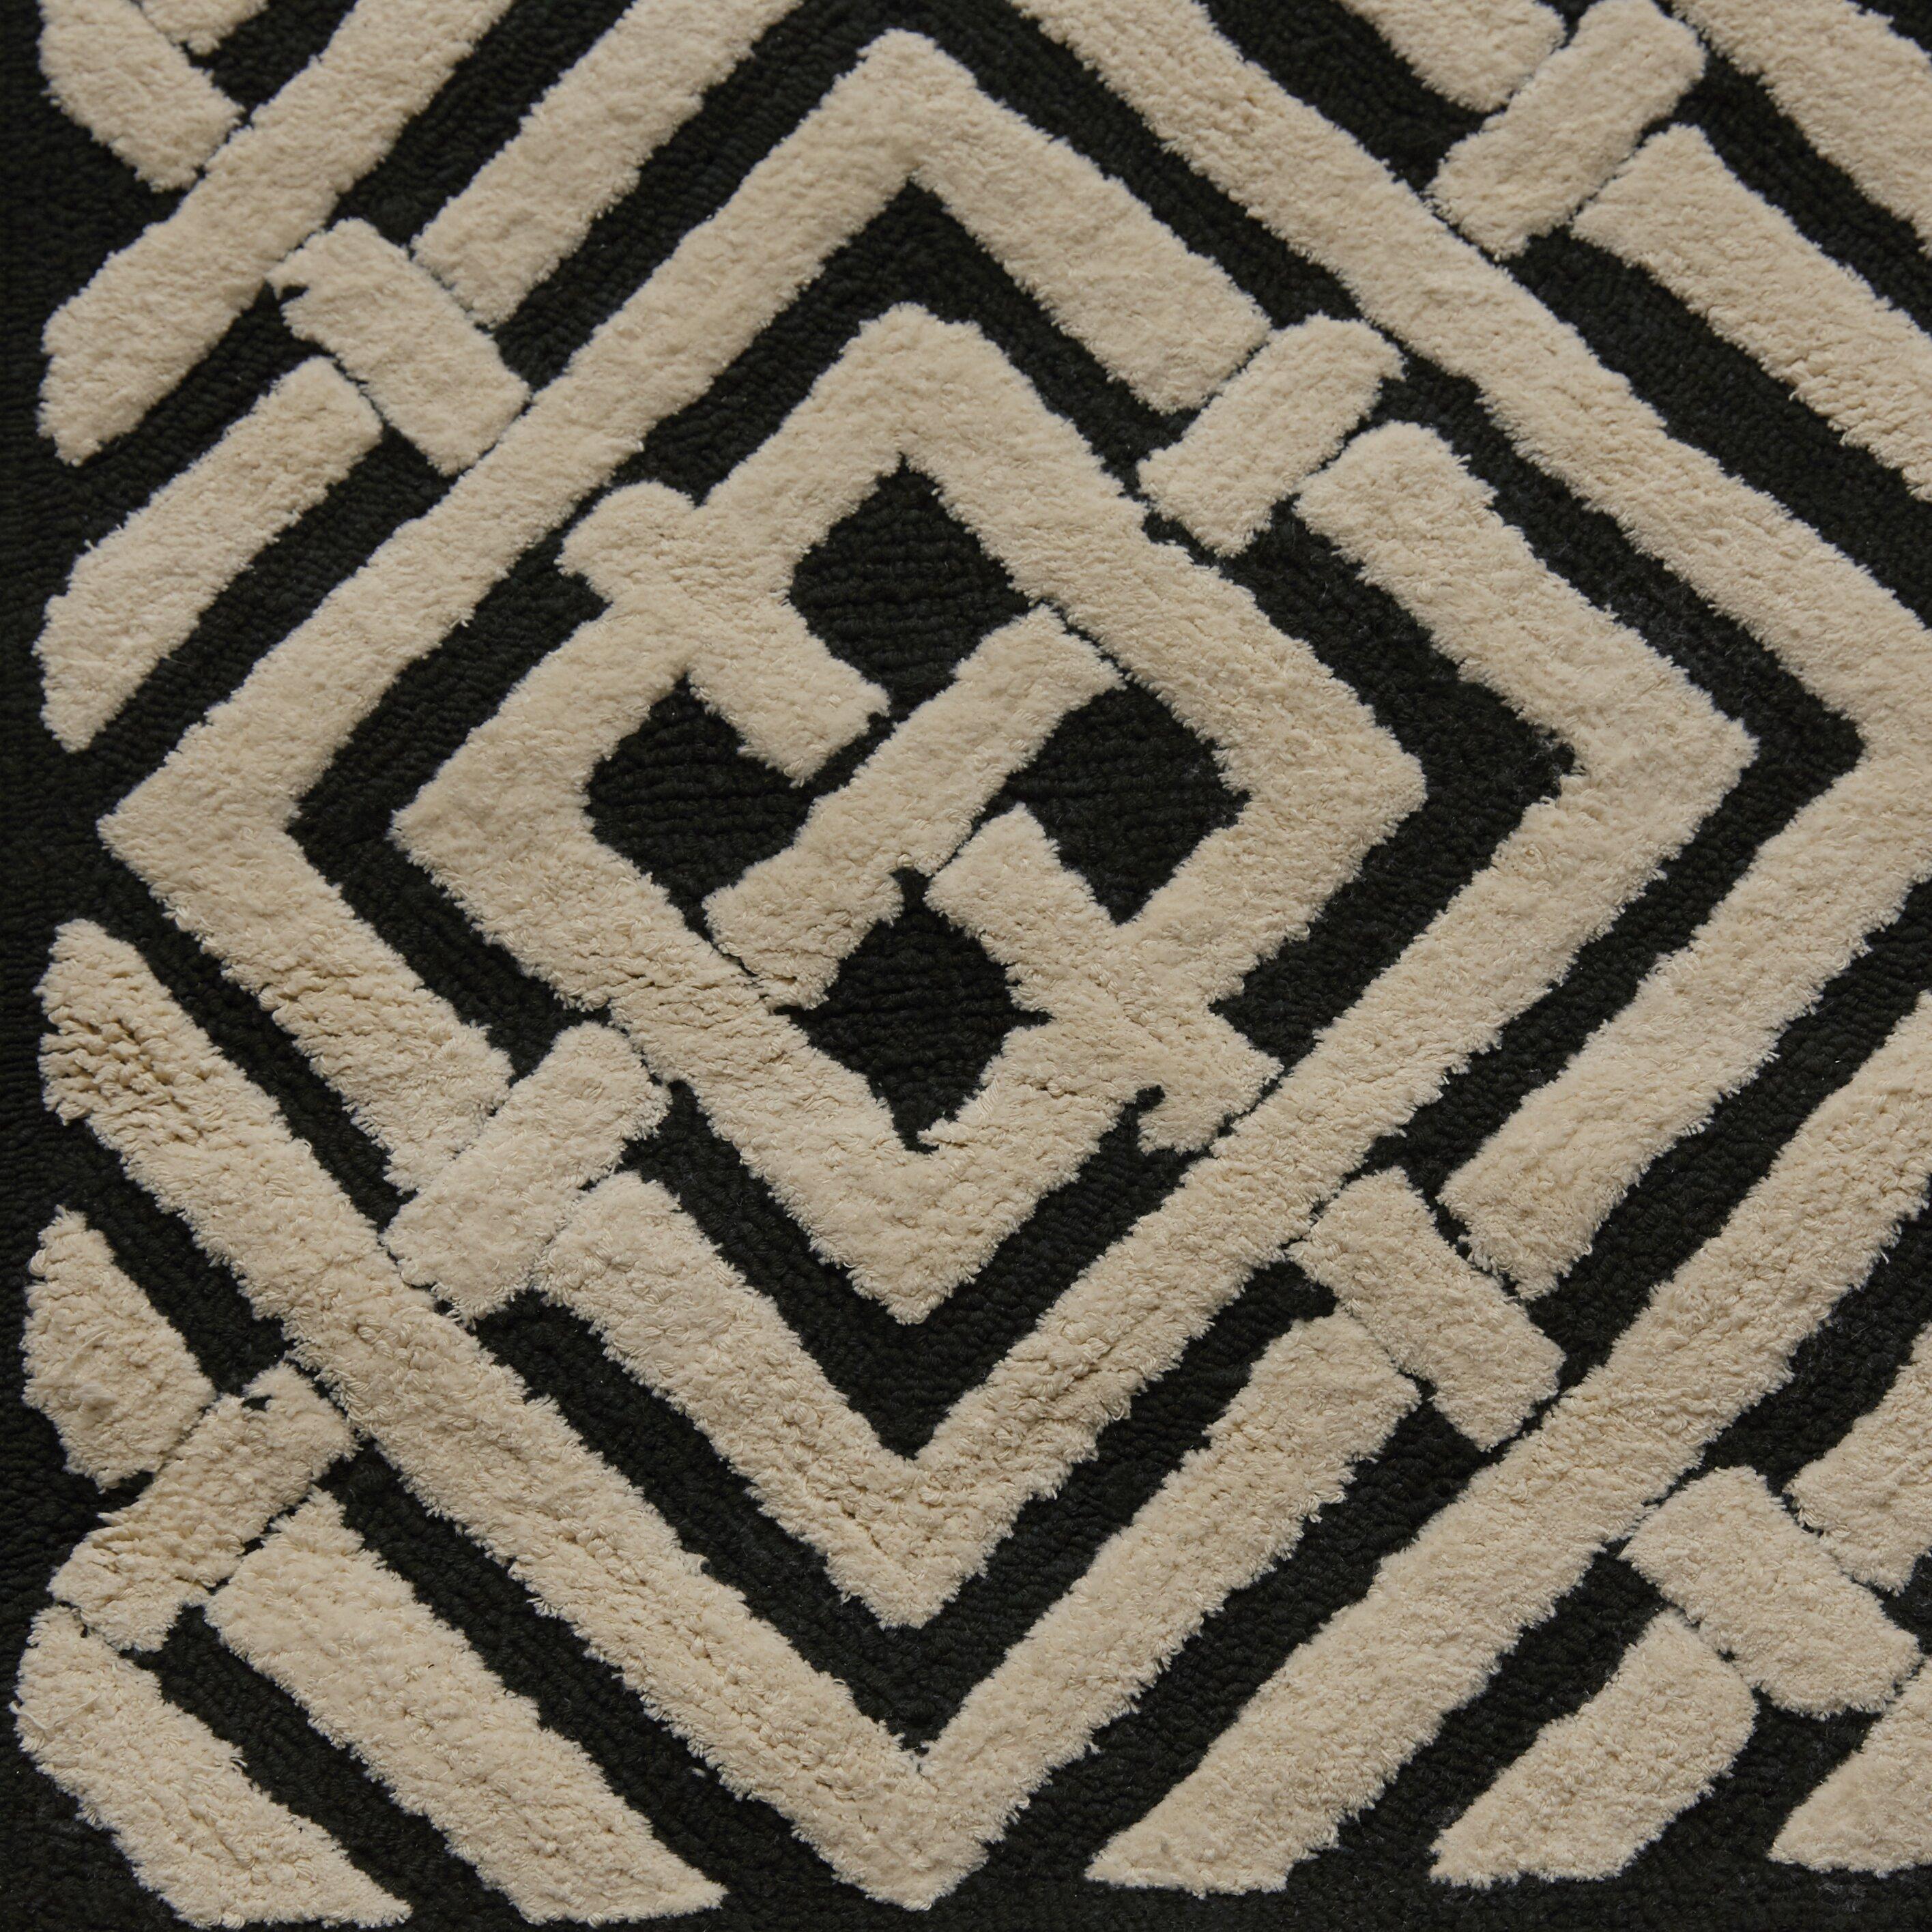 Safavieh Newport Black/White Geometric Area Rug & Reviews ...